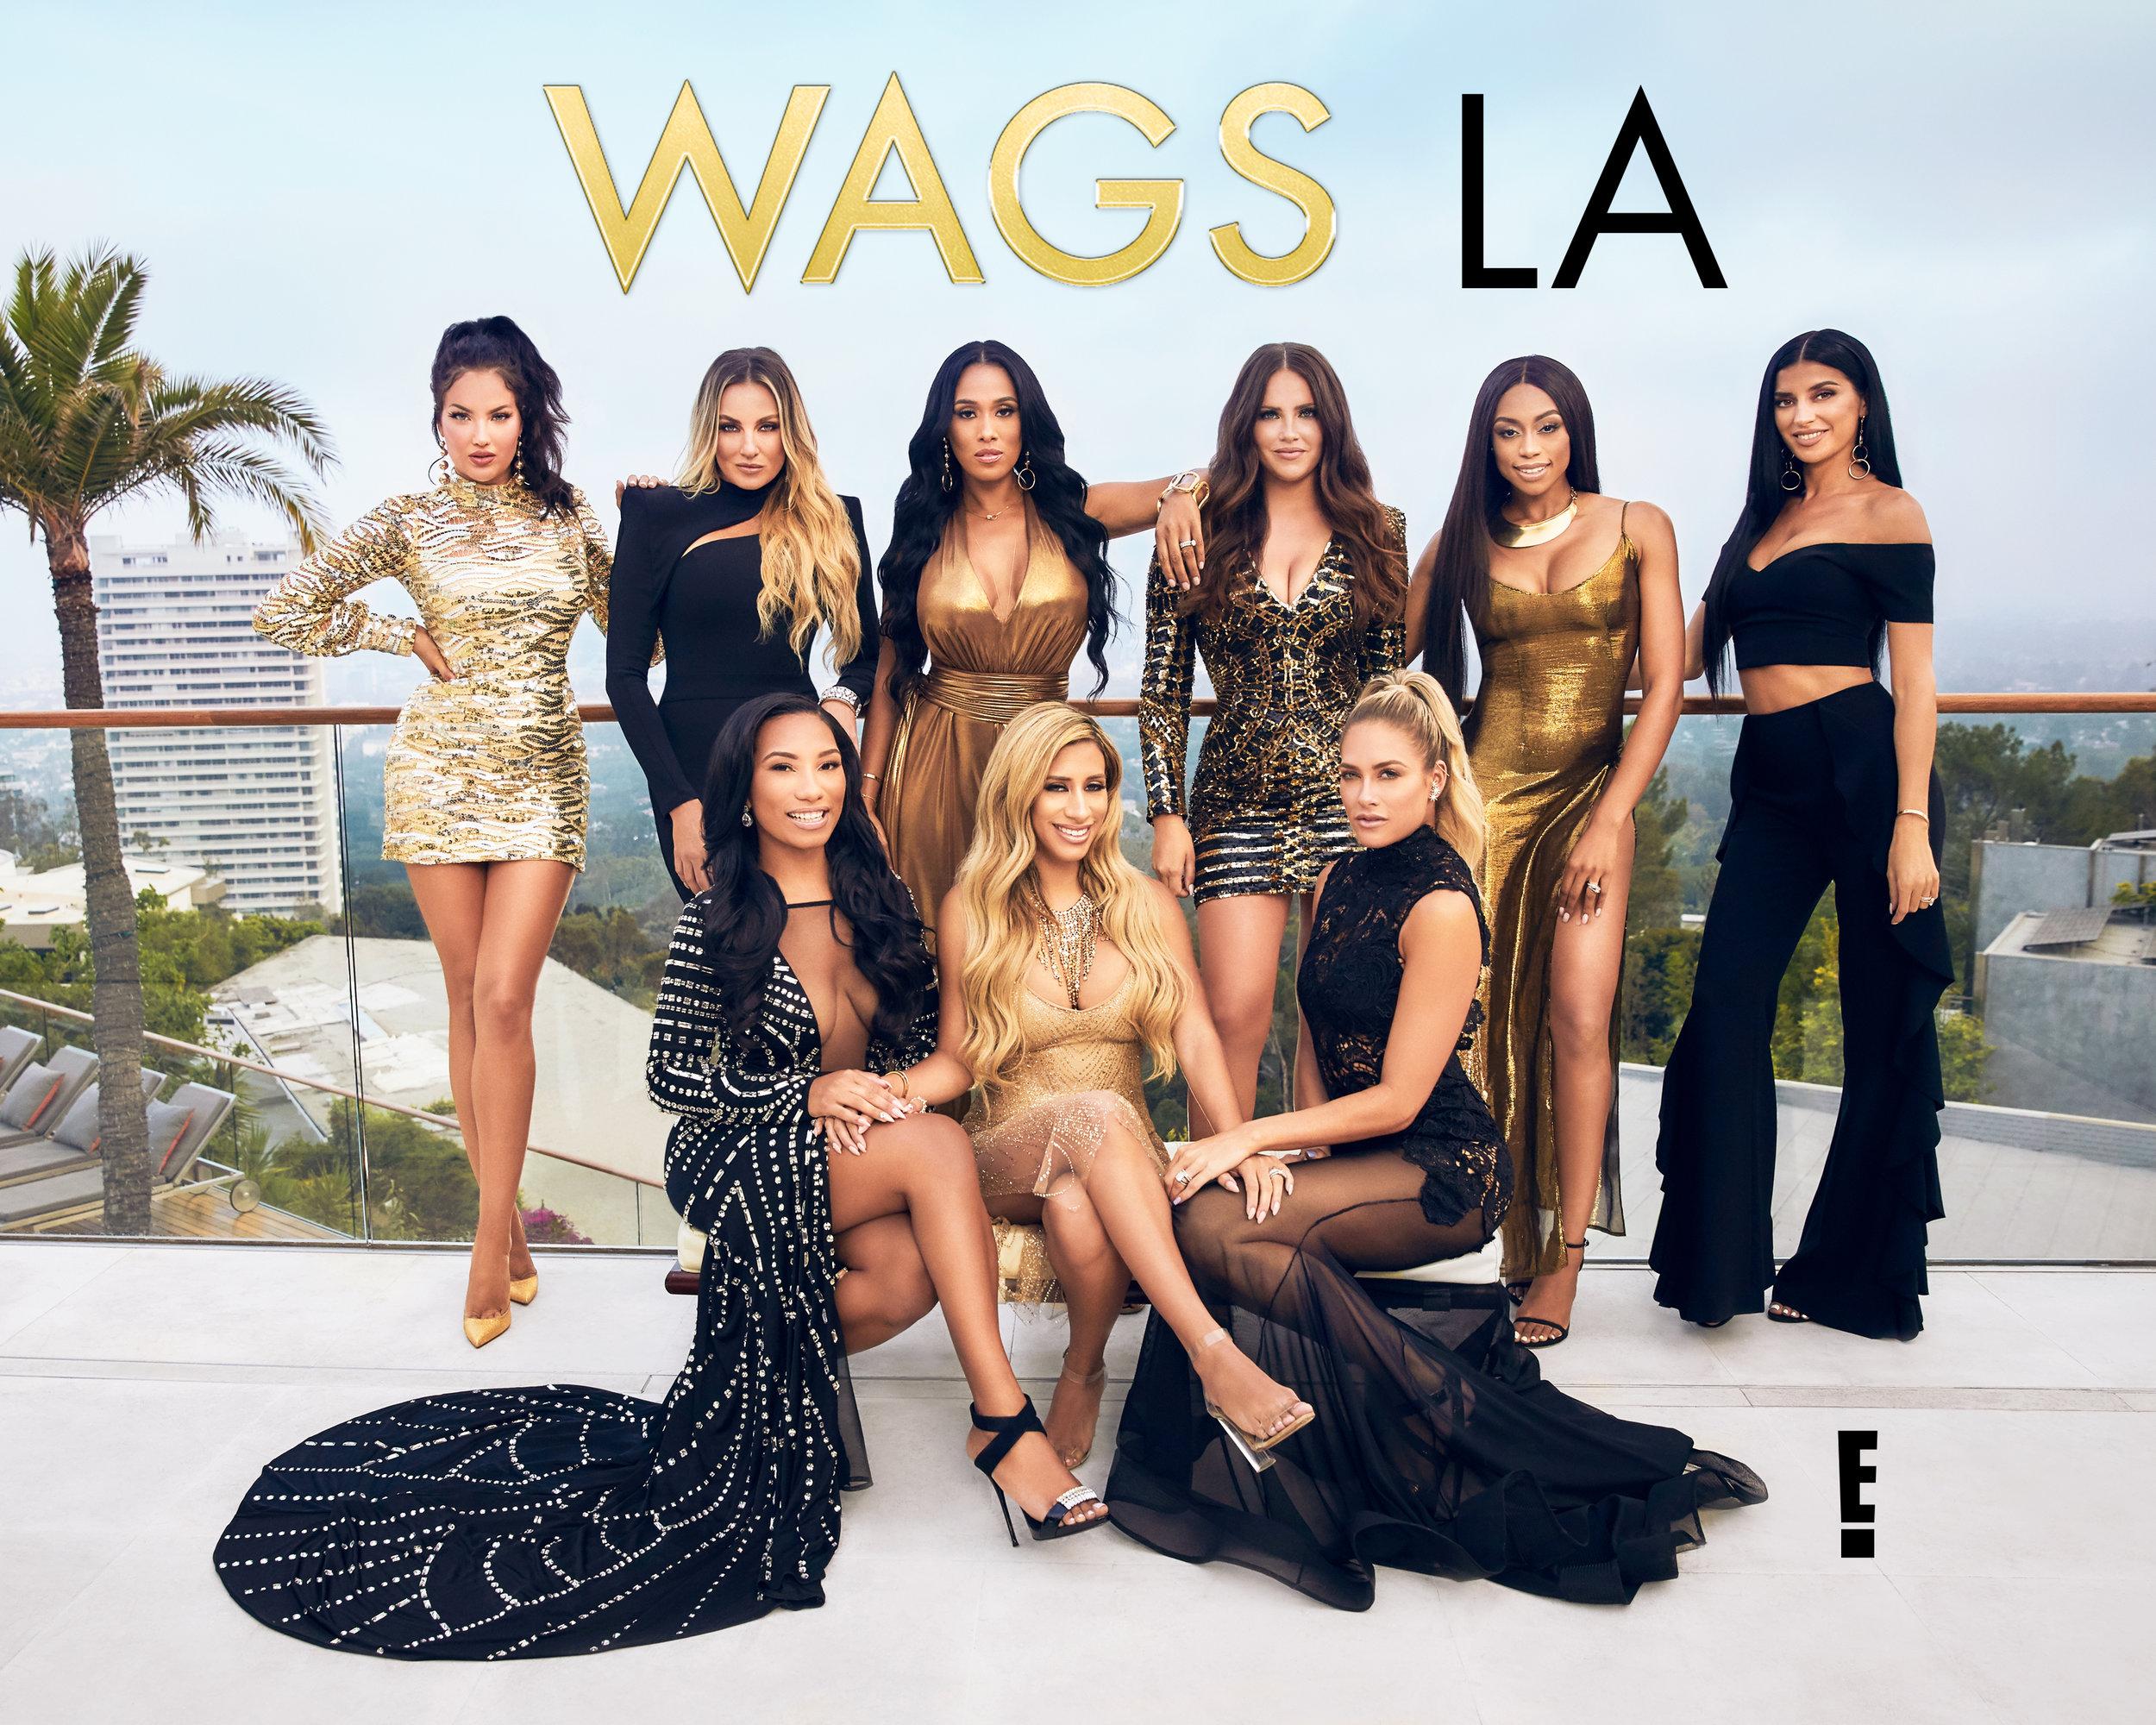 WAGS_LA_S3_PRGroup_10x8_Brand.jpg